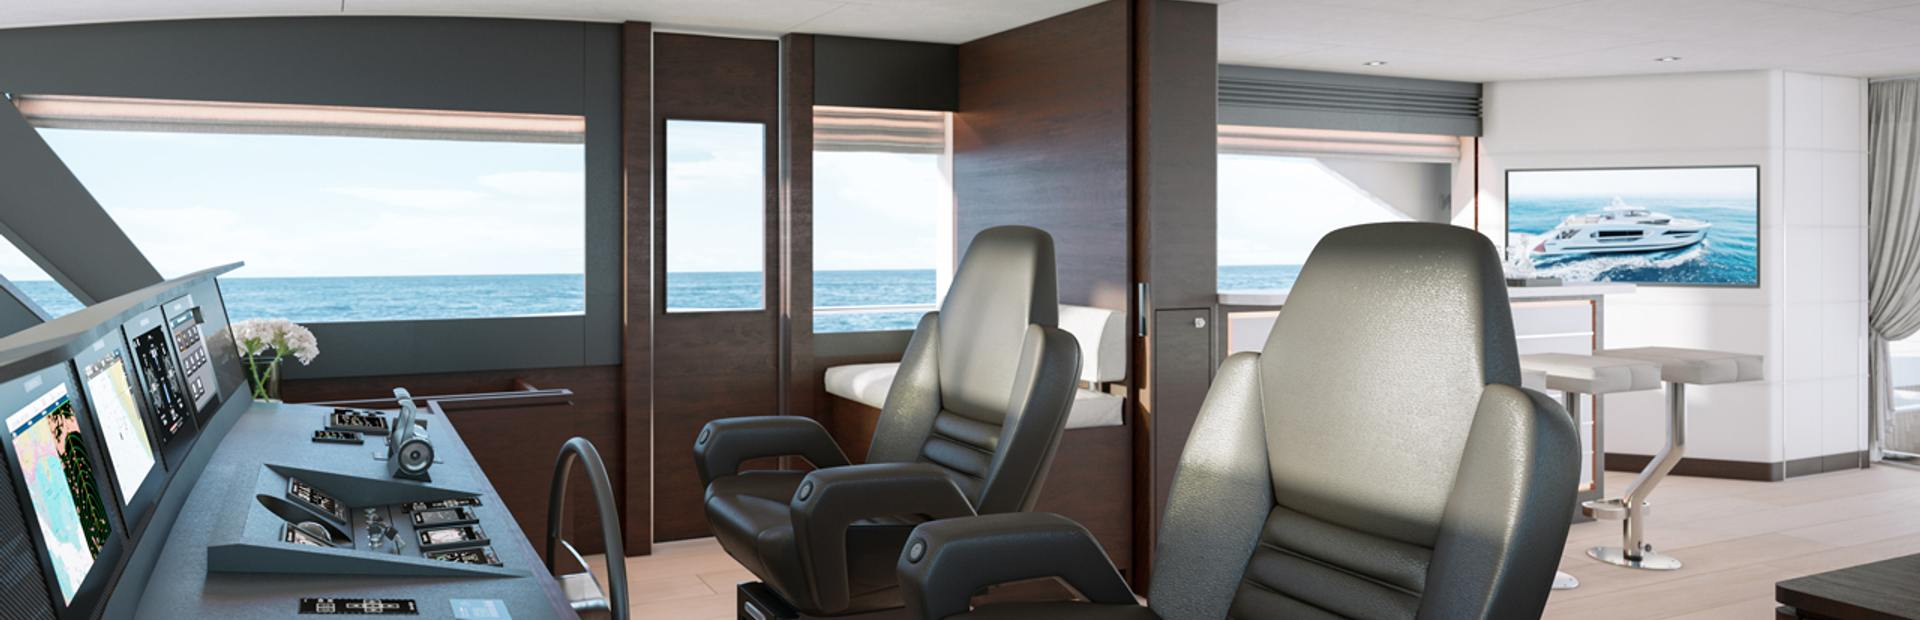 FD102 Skyline Yacht Charter